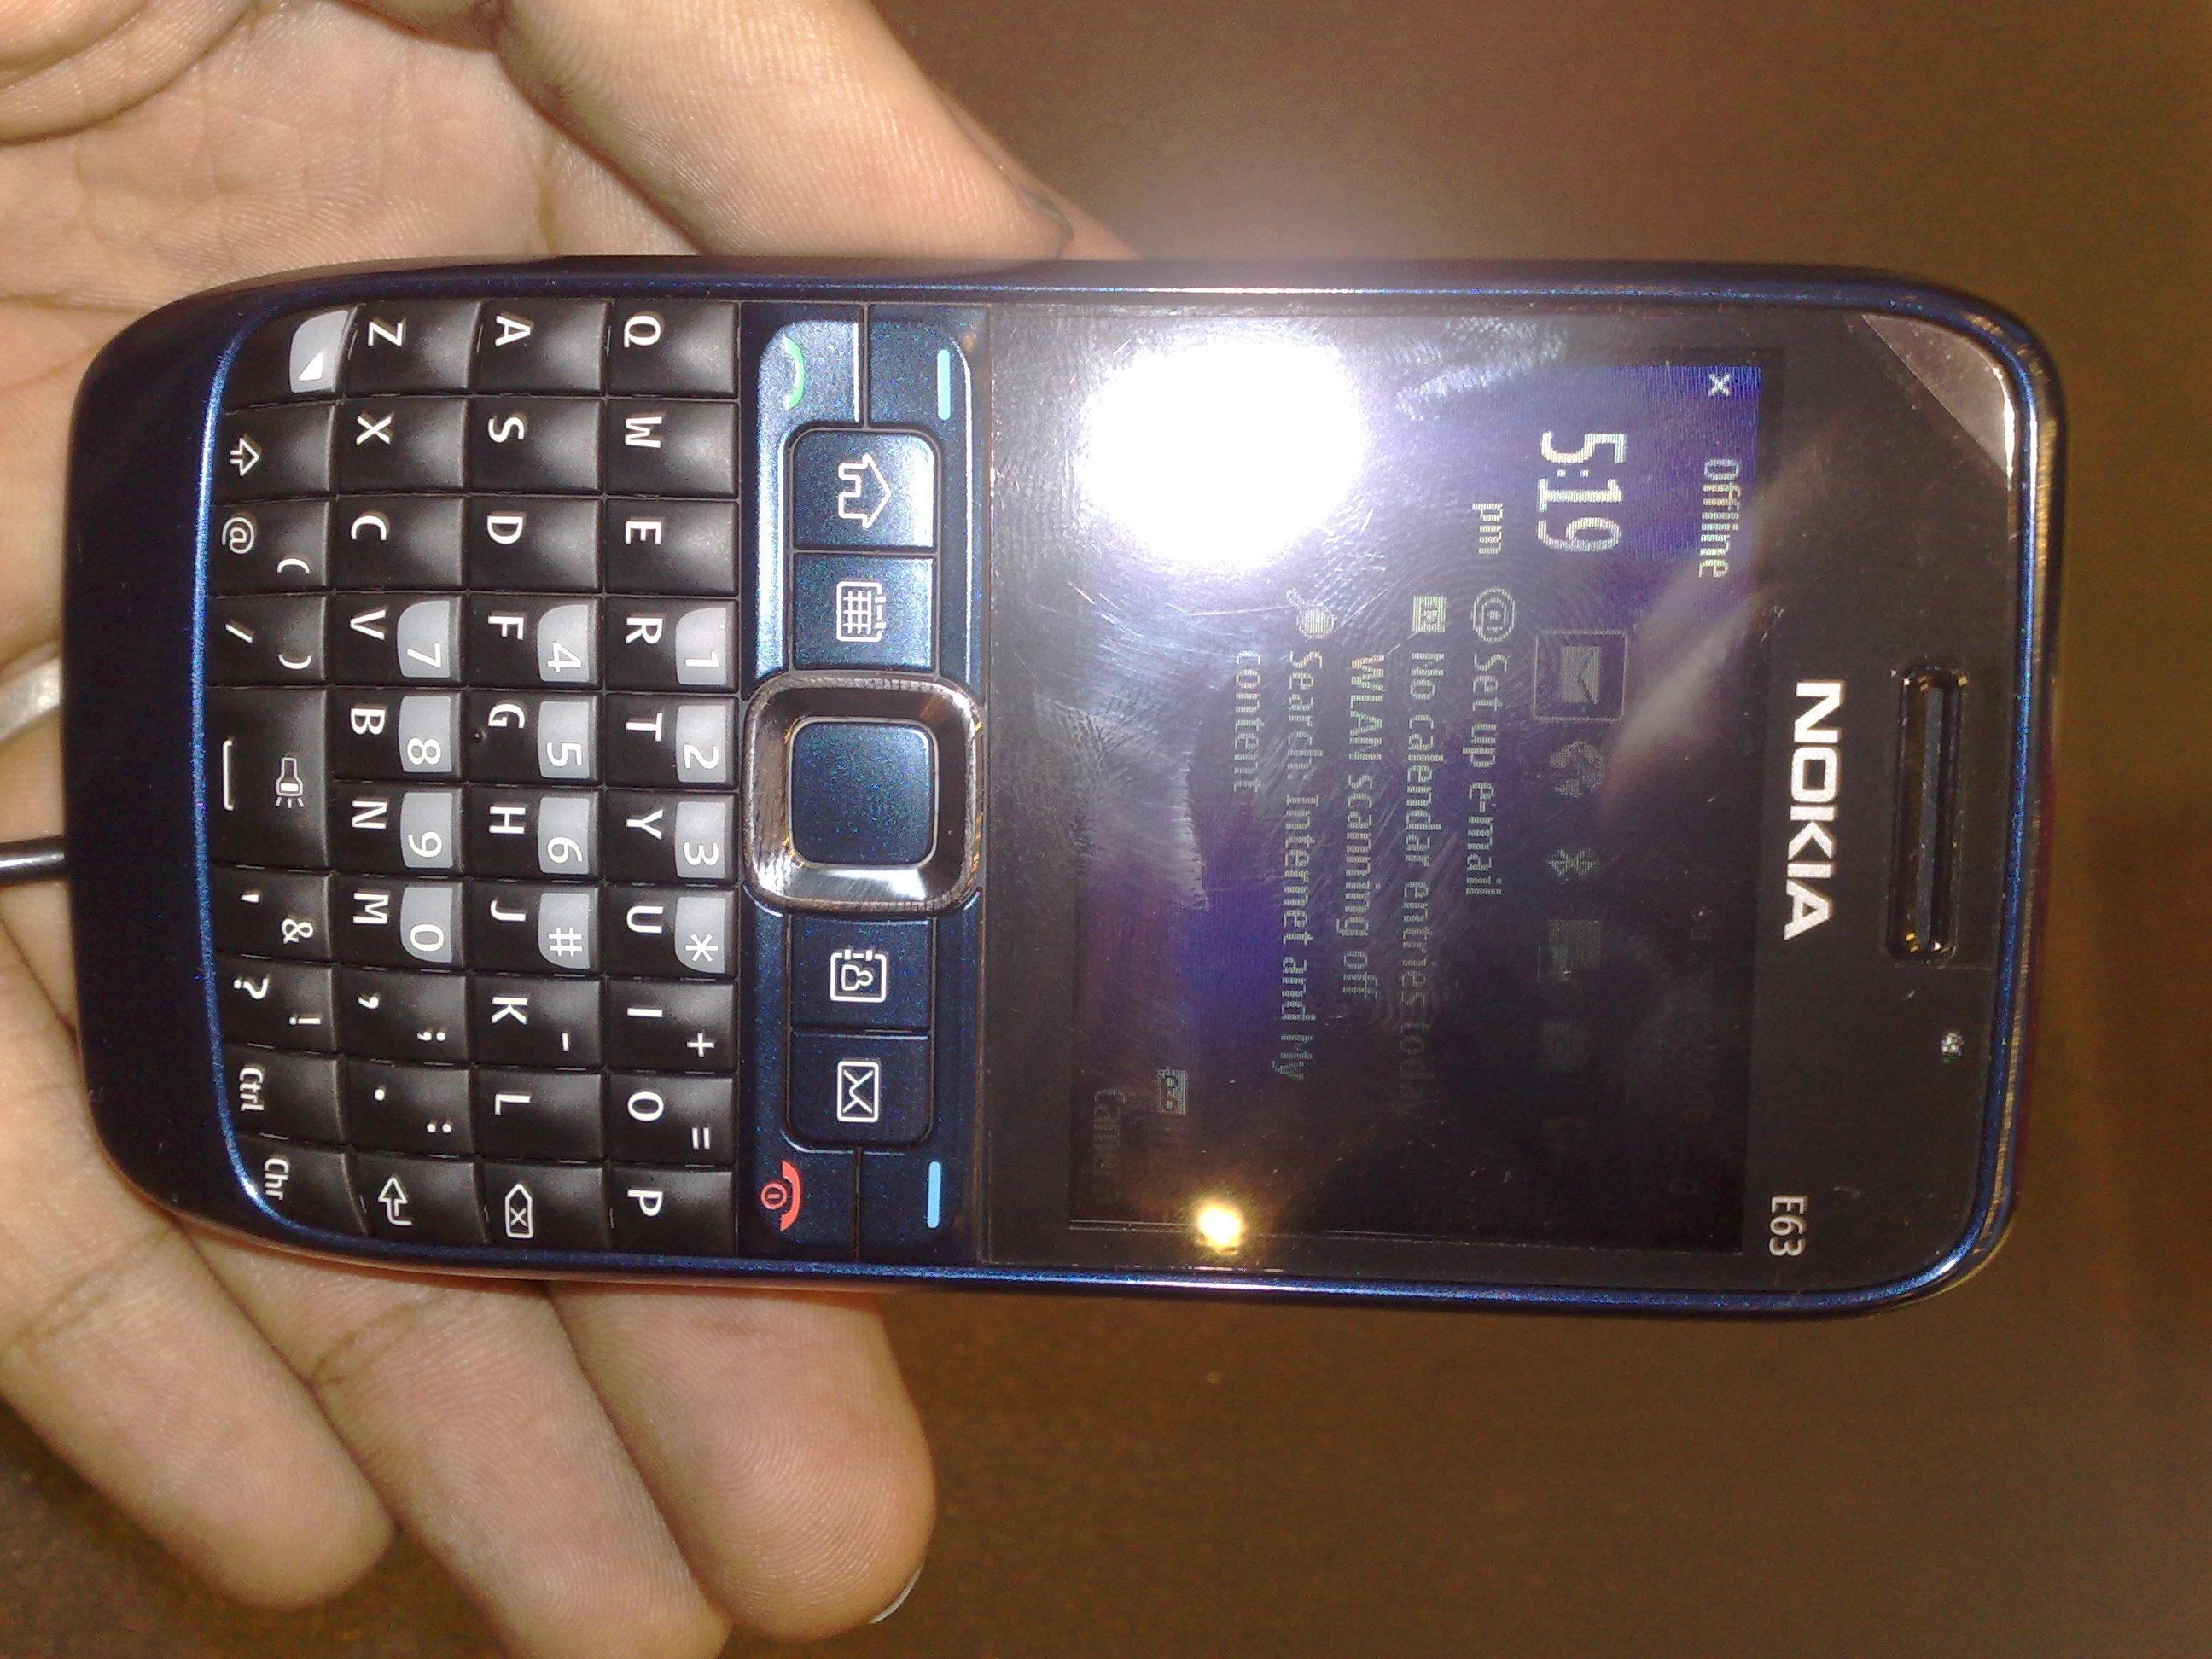 Nokia E63 RF (Radio Frequency) Safe